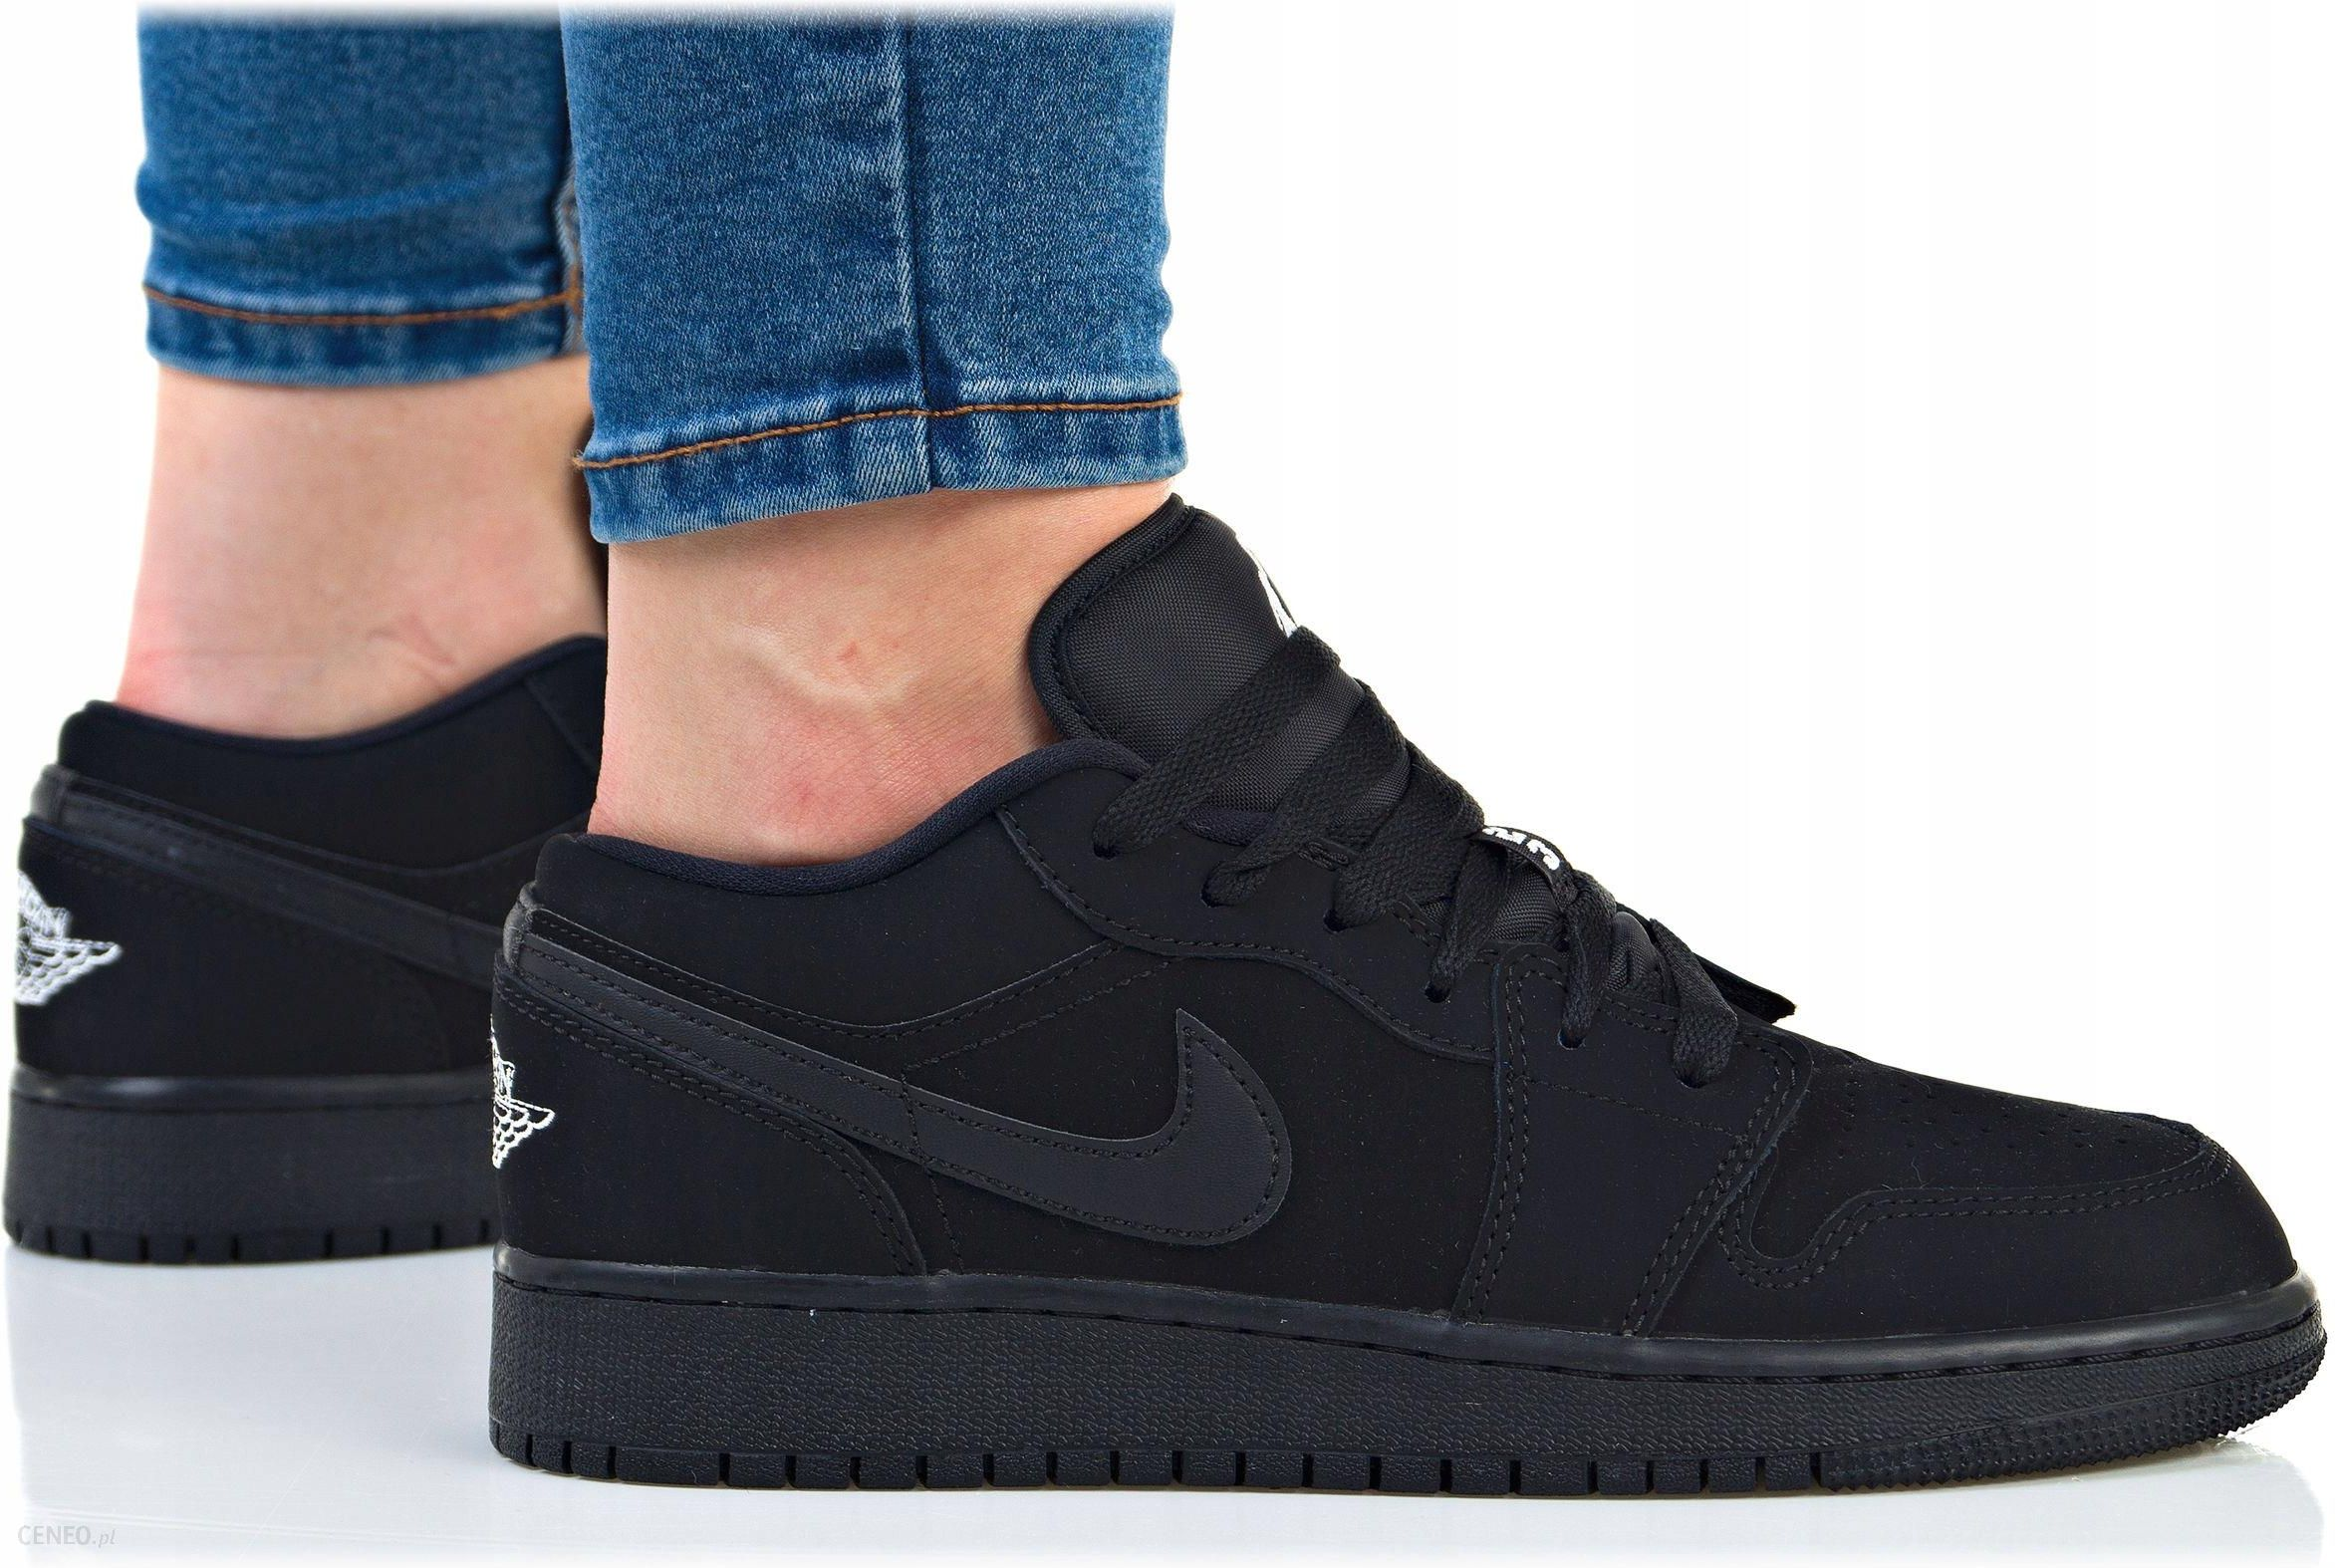 Buty Nike Damskie Air Jordan 1 Low (bg) 553560-019 - Ceny i opinie ... f577ae0f89a